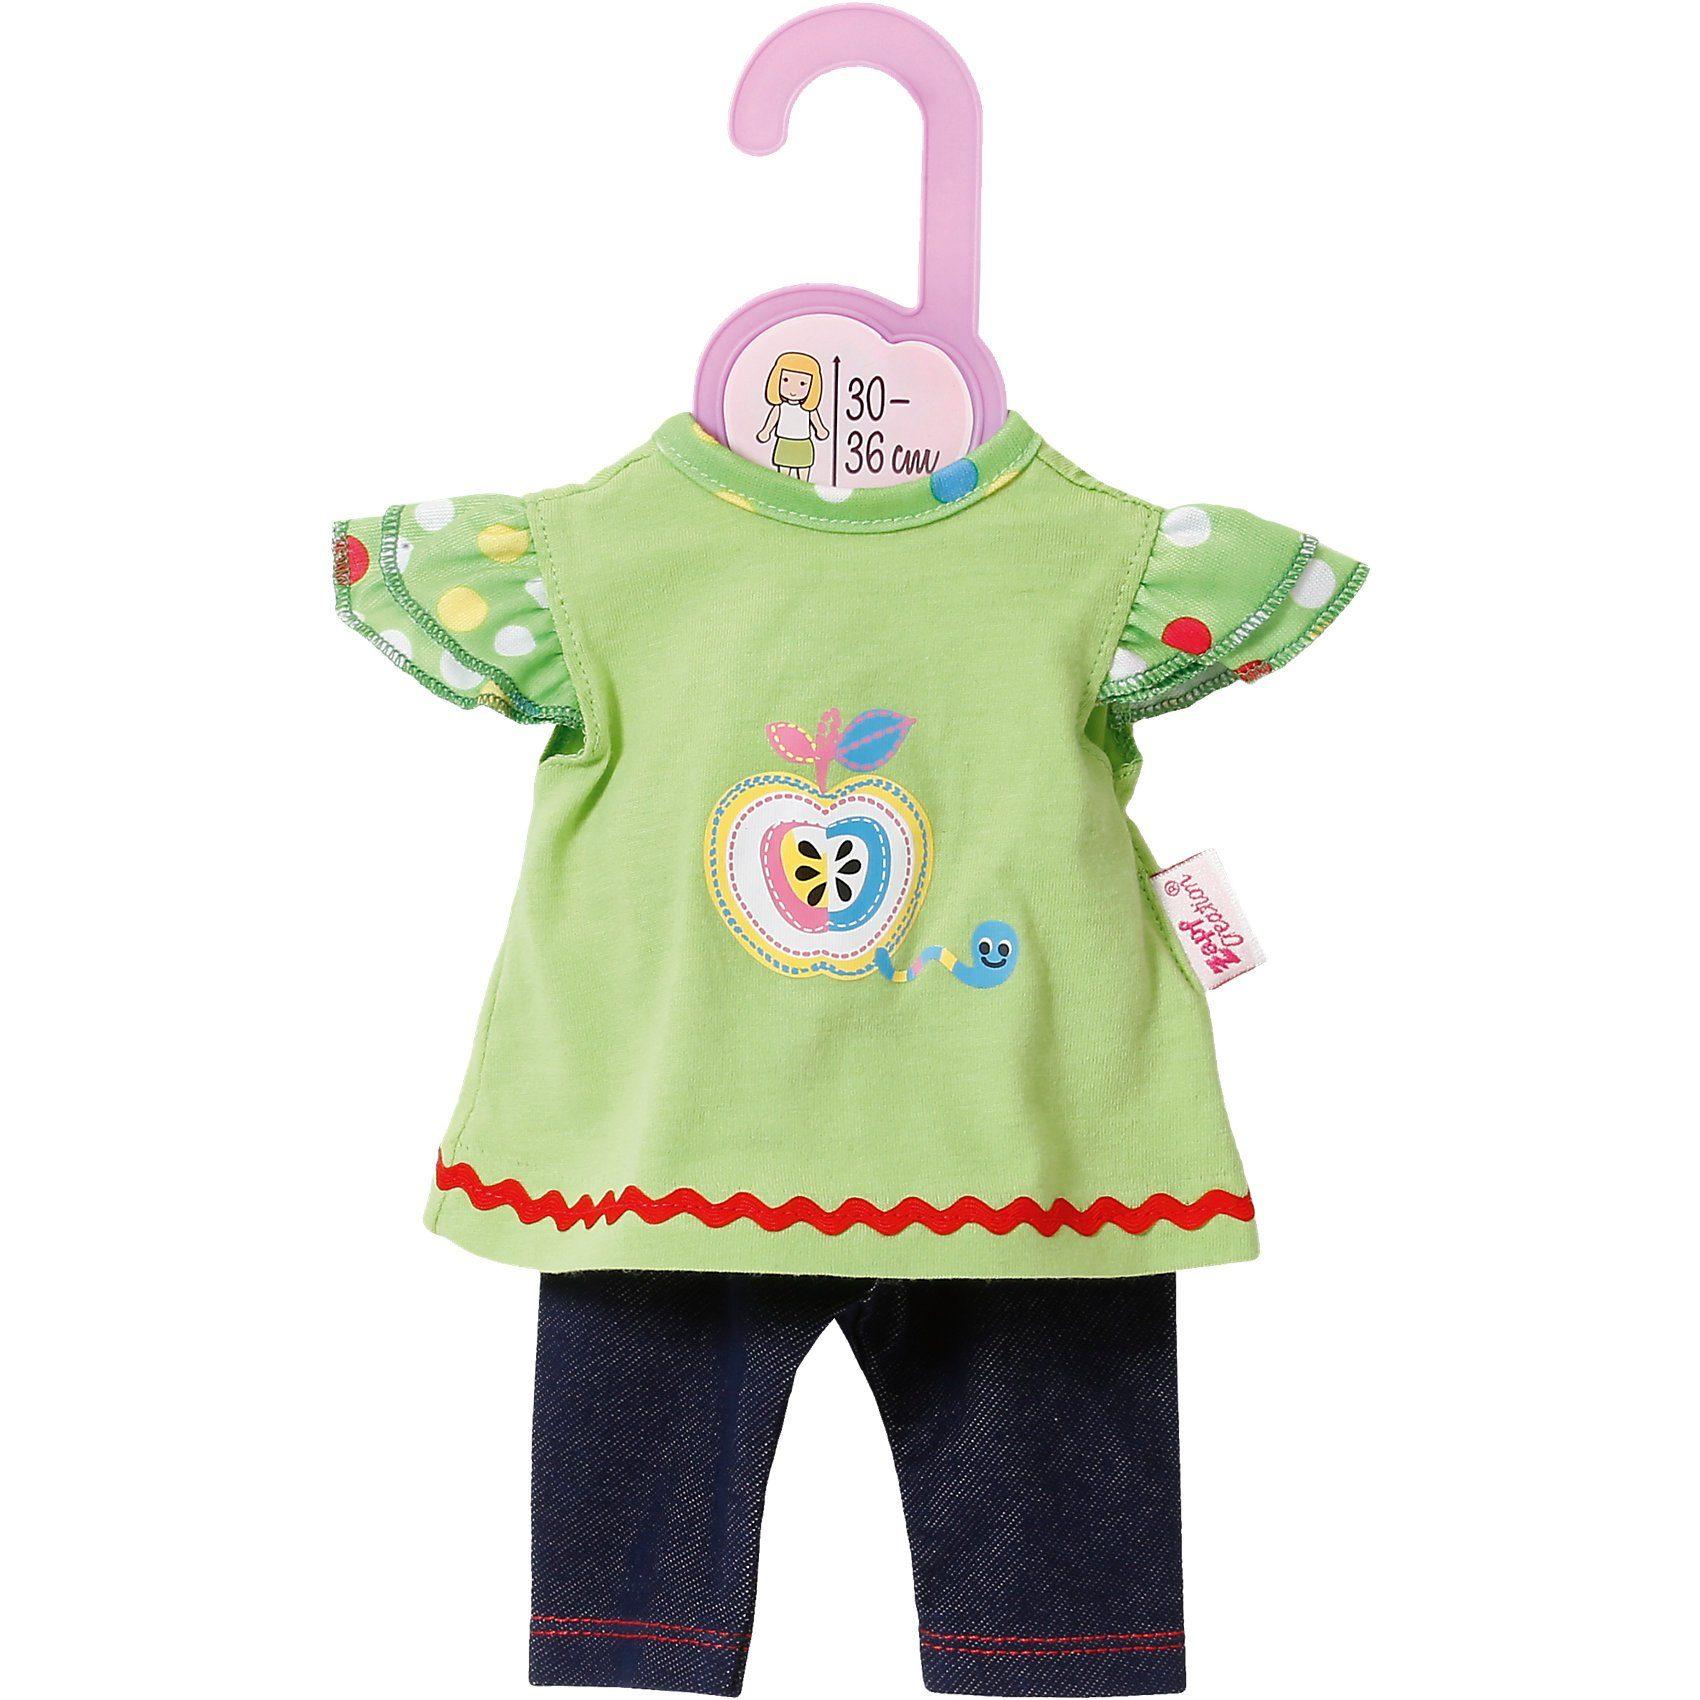 Zapf Creation Dolly Moda Puppenkleidung Shirt mit Leggings 30-36 cm